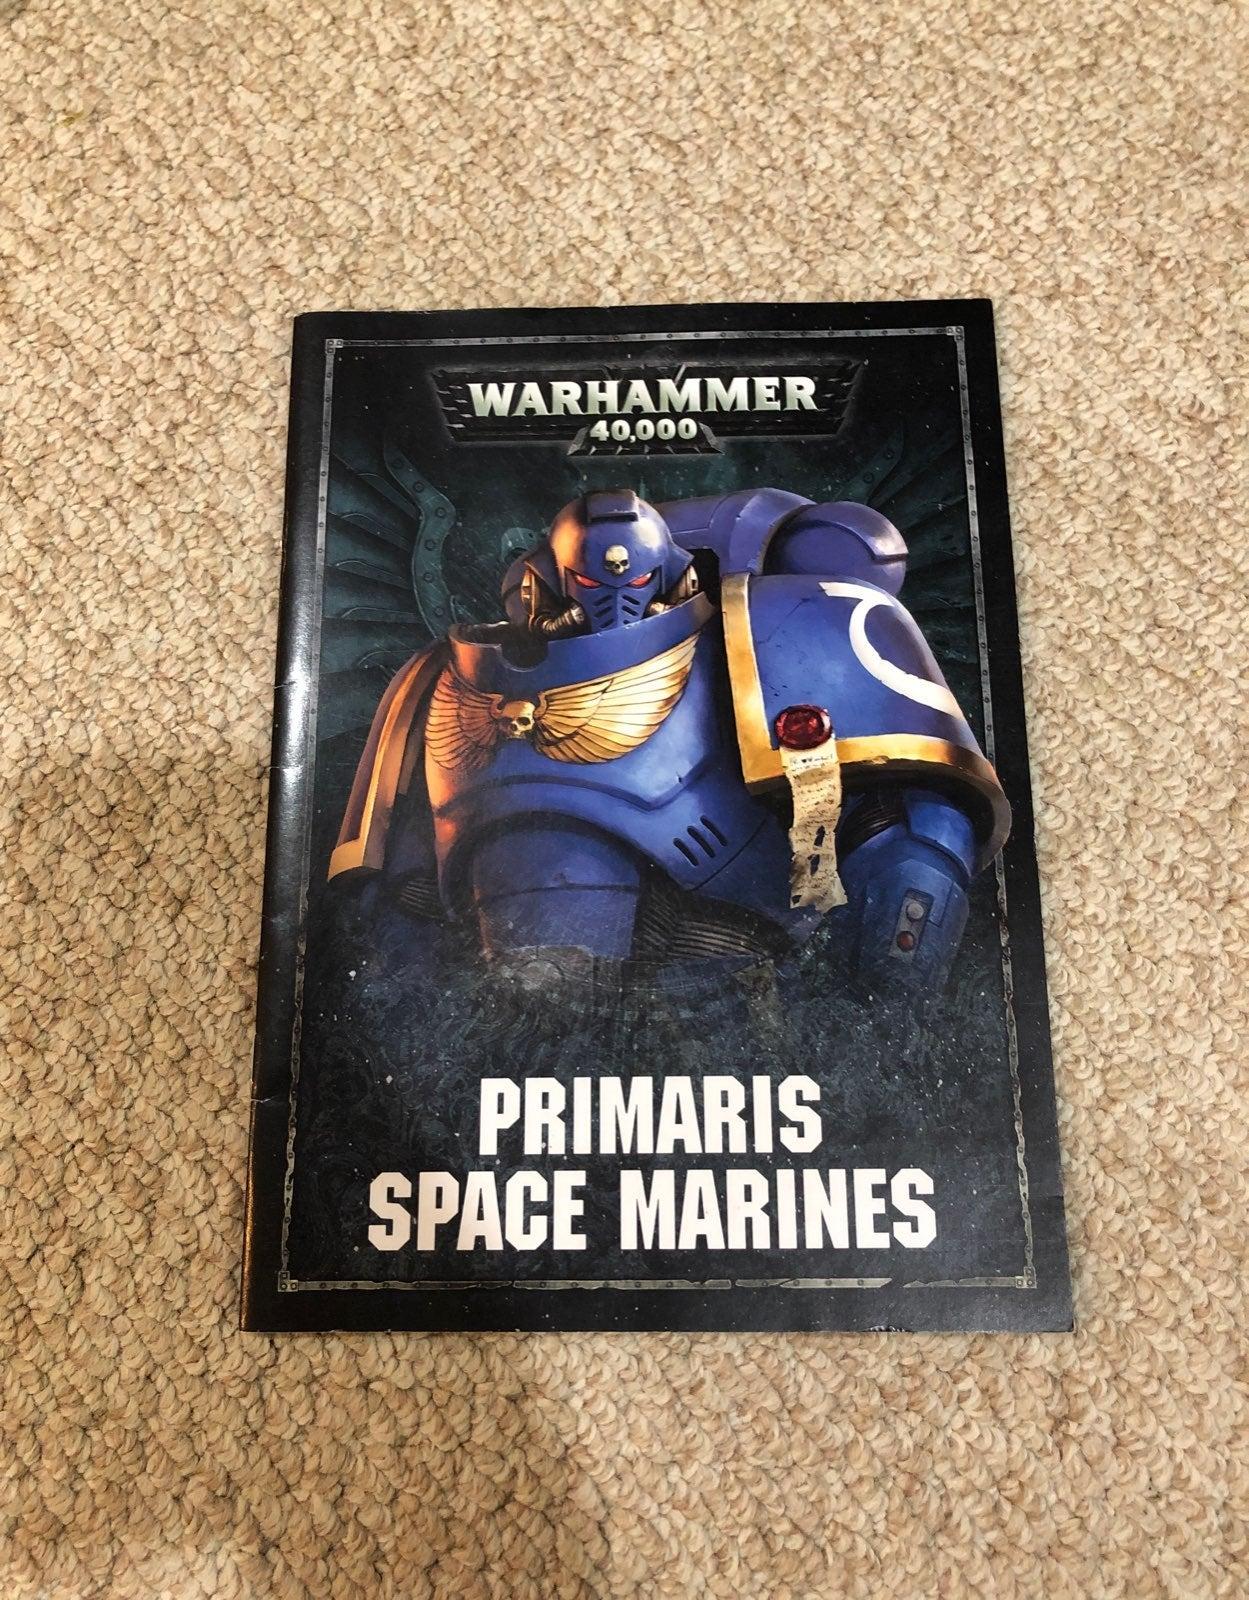 warhammer 40k primaris data book